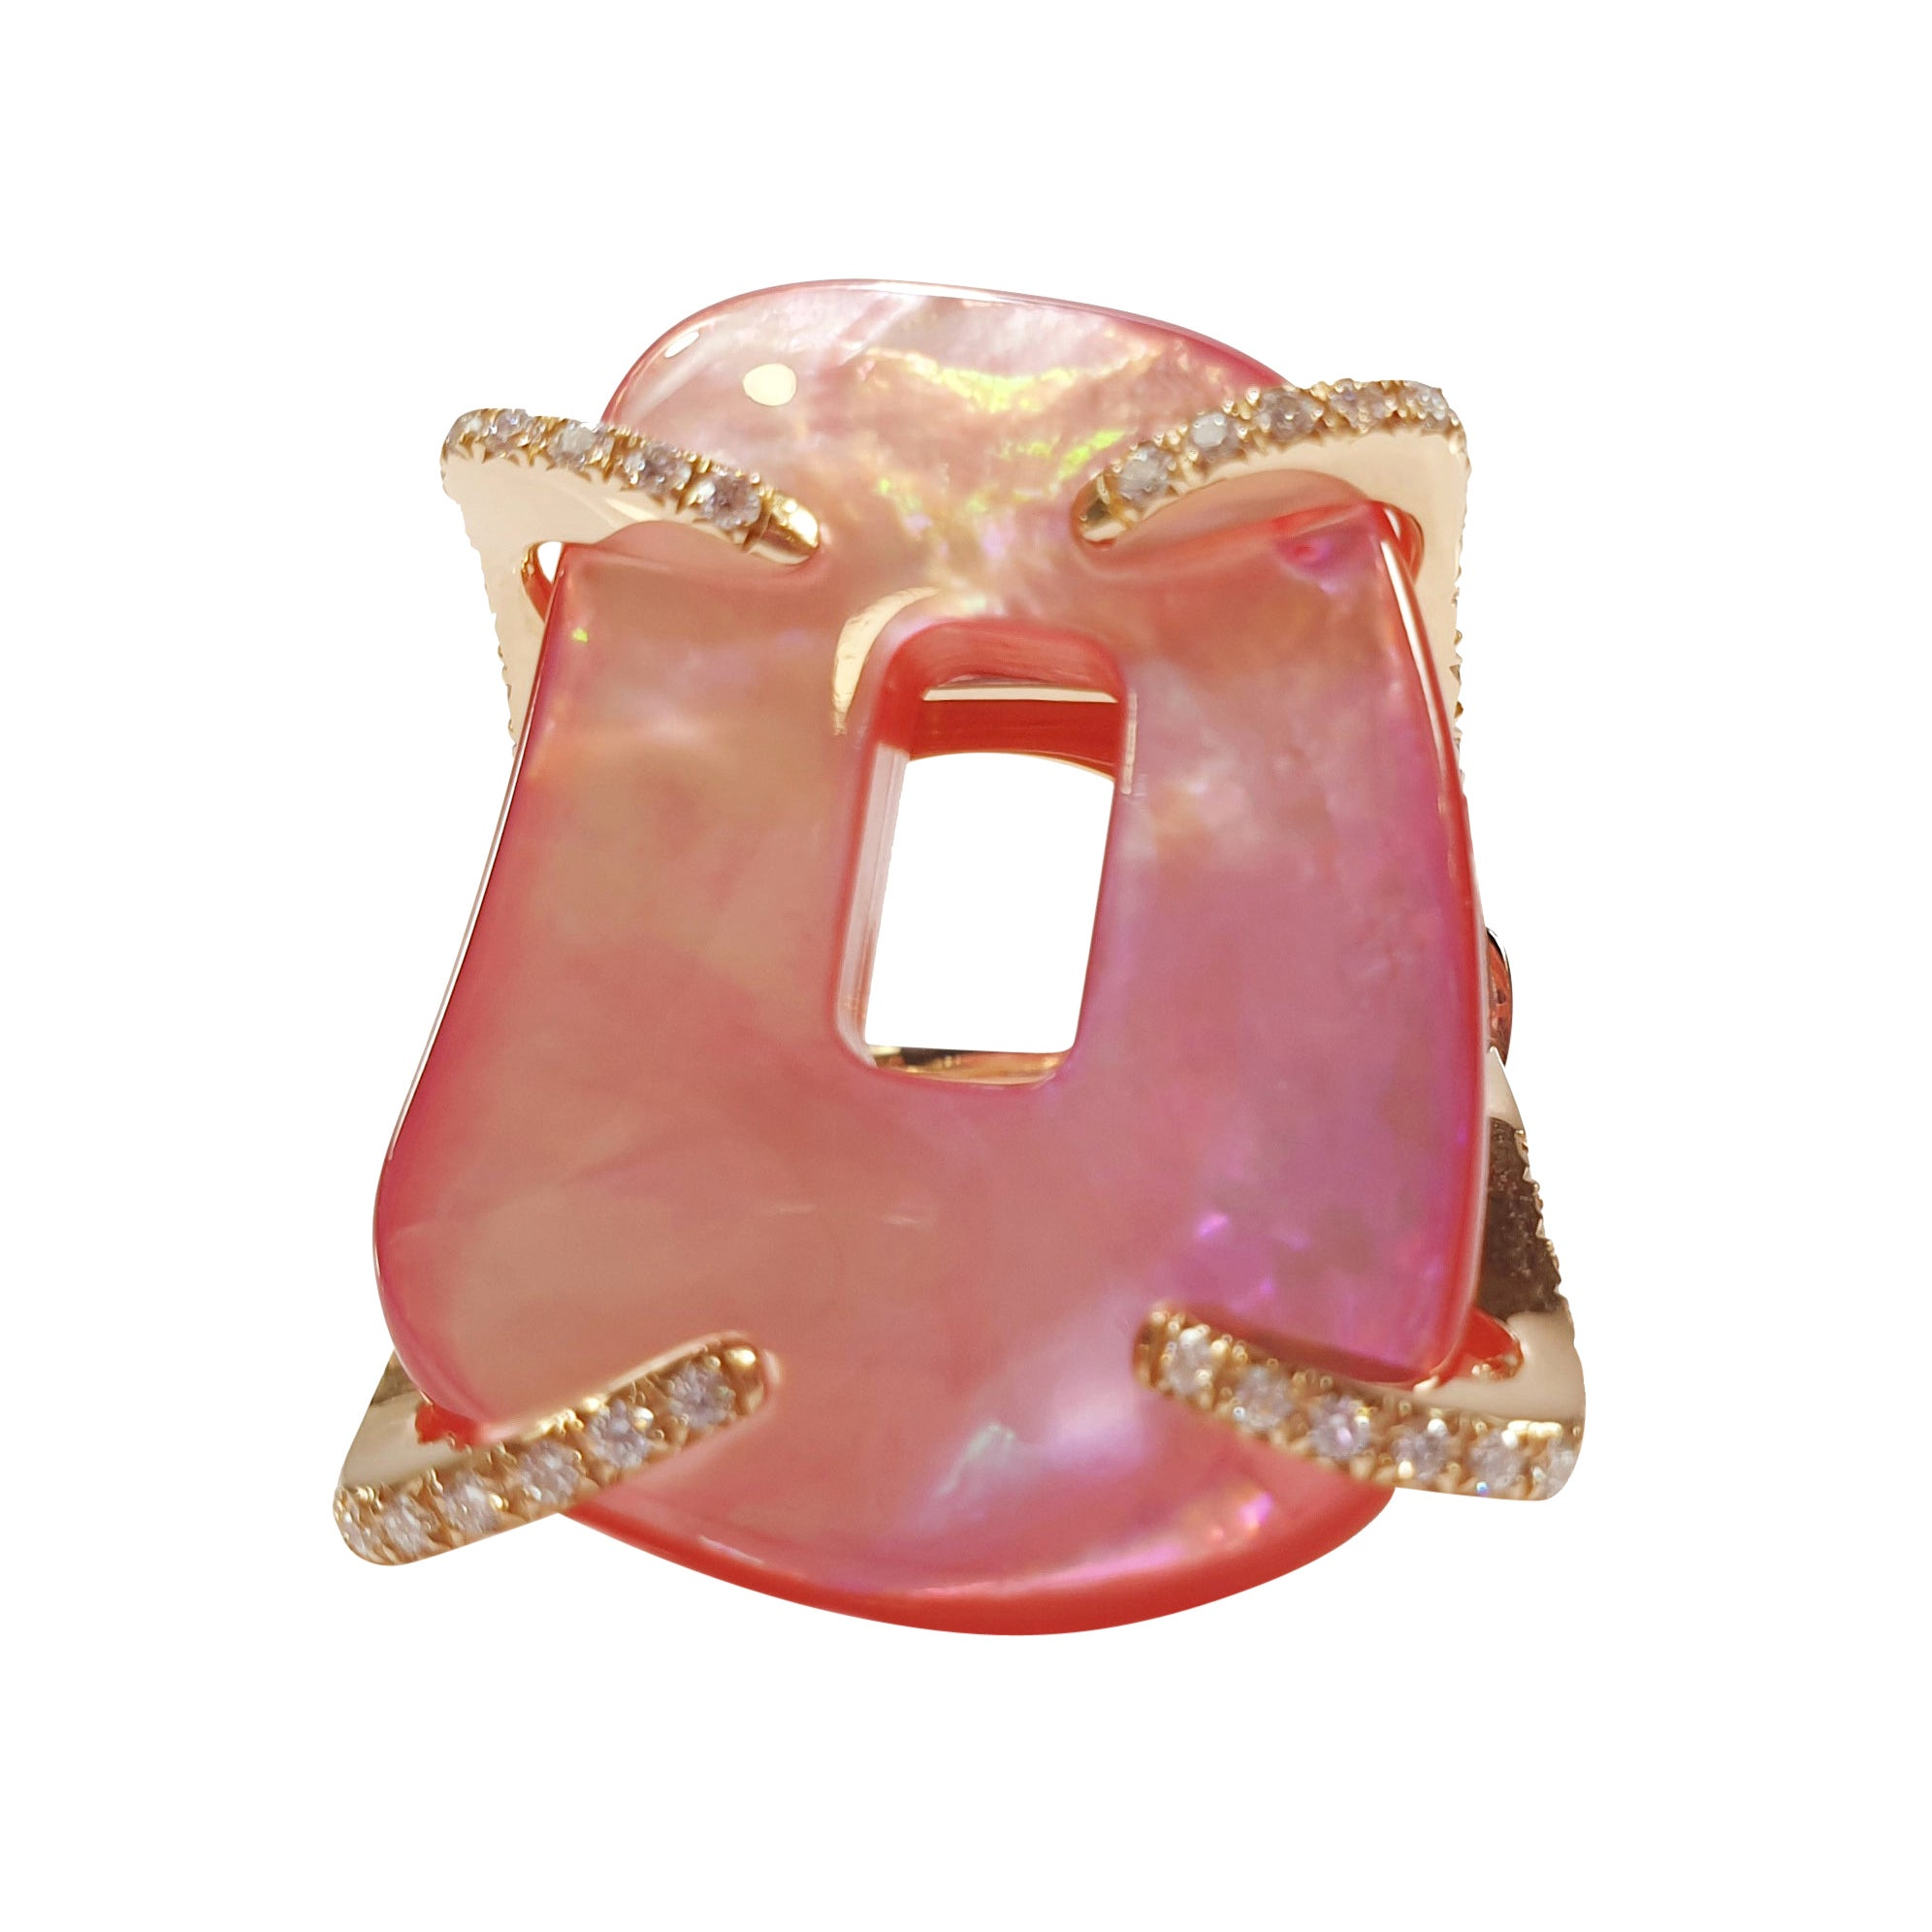 Mattioli Puzzle Collection 18 Karat Rose Gold Ring with White Diamonds